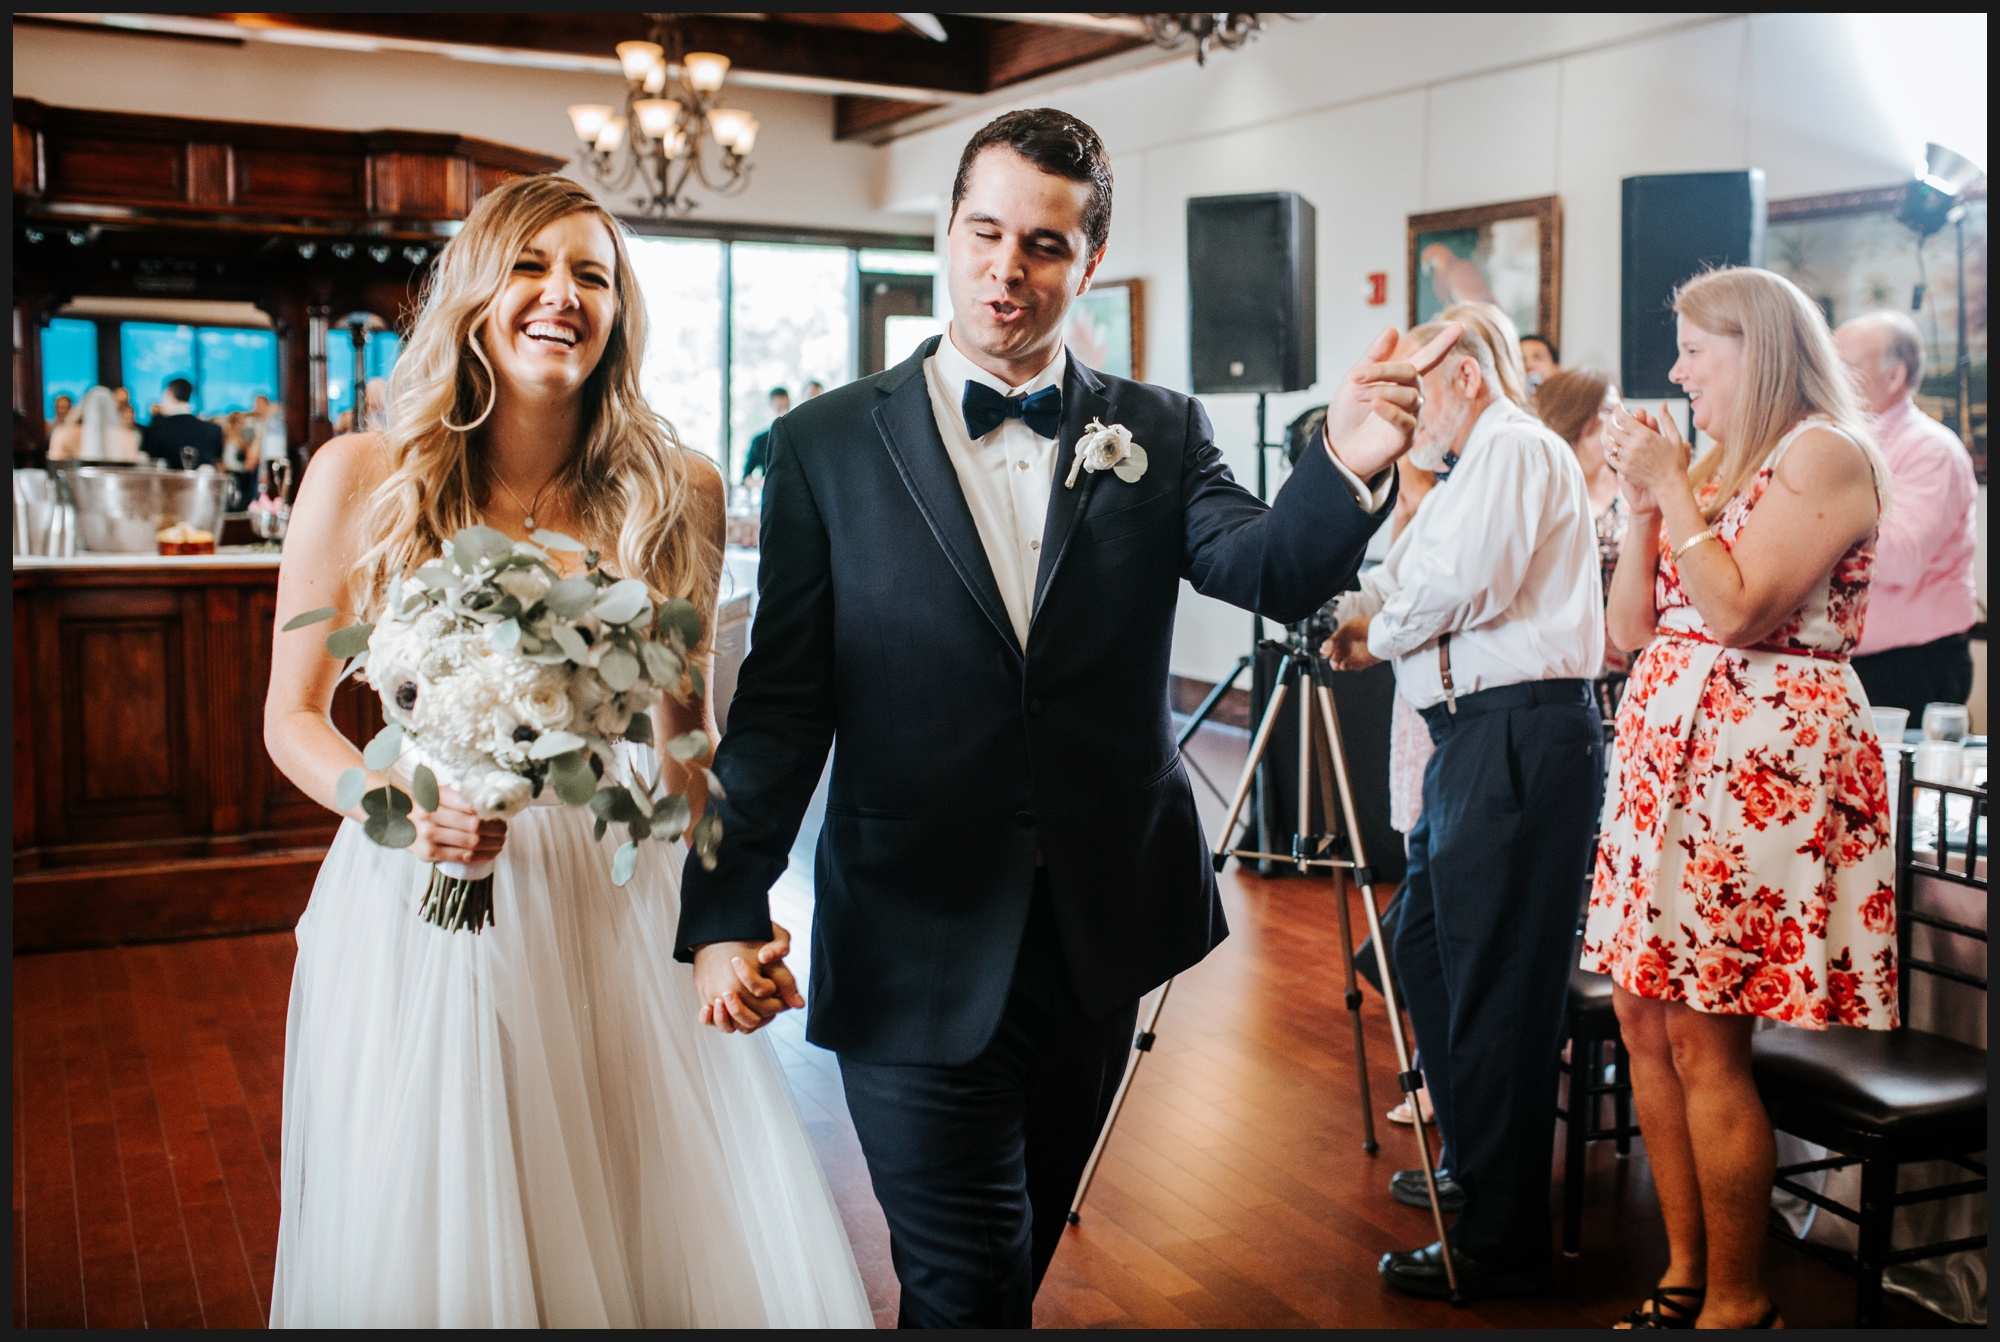 Orlando-Wedding-Photographer-destination-wedding-photographer-florida-wedding-photographer-bohemian-wedding-photographer_0295.jpg